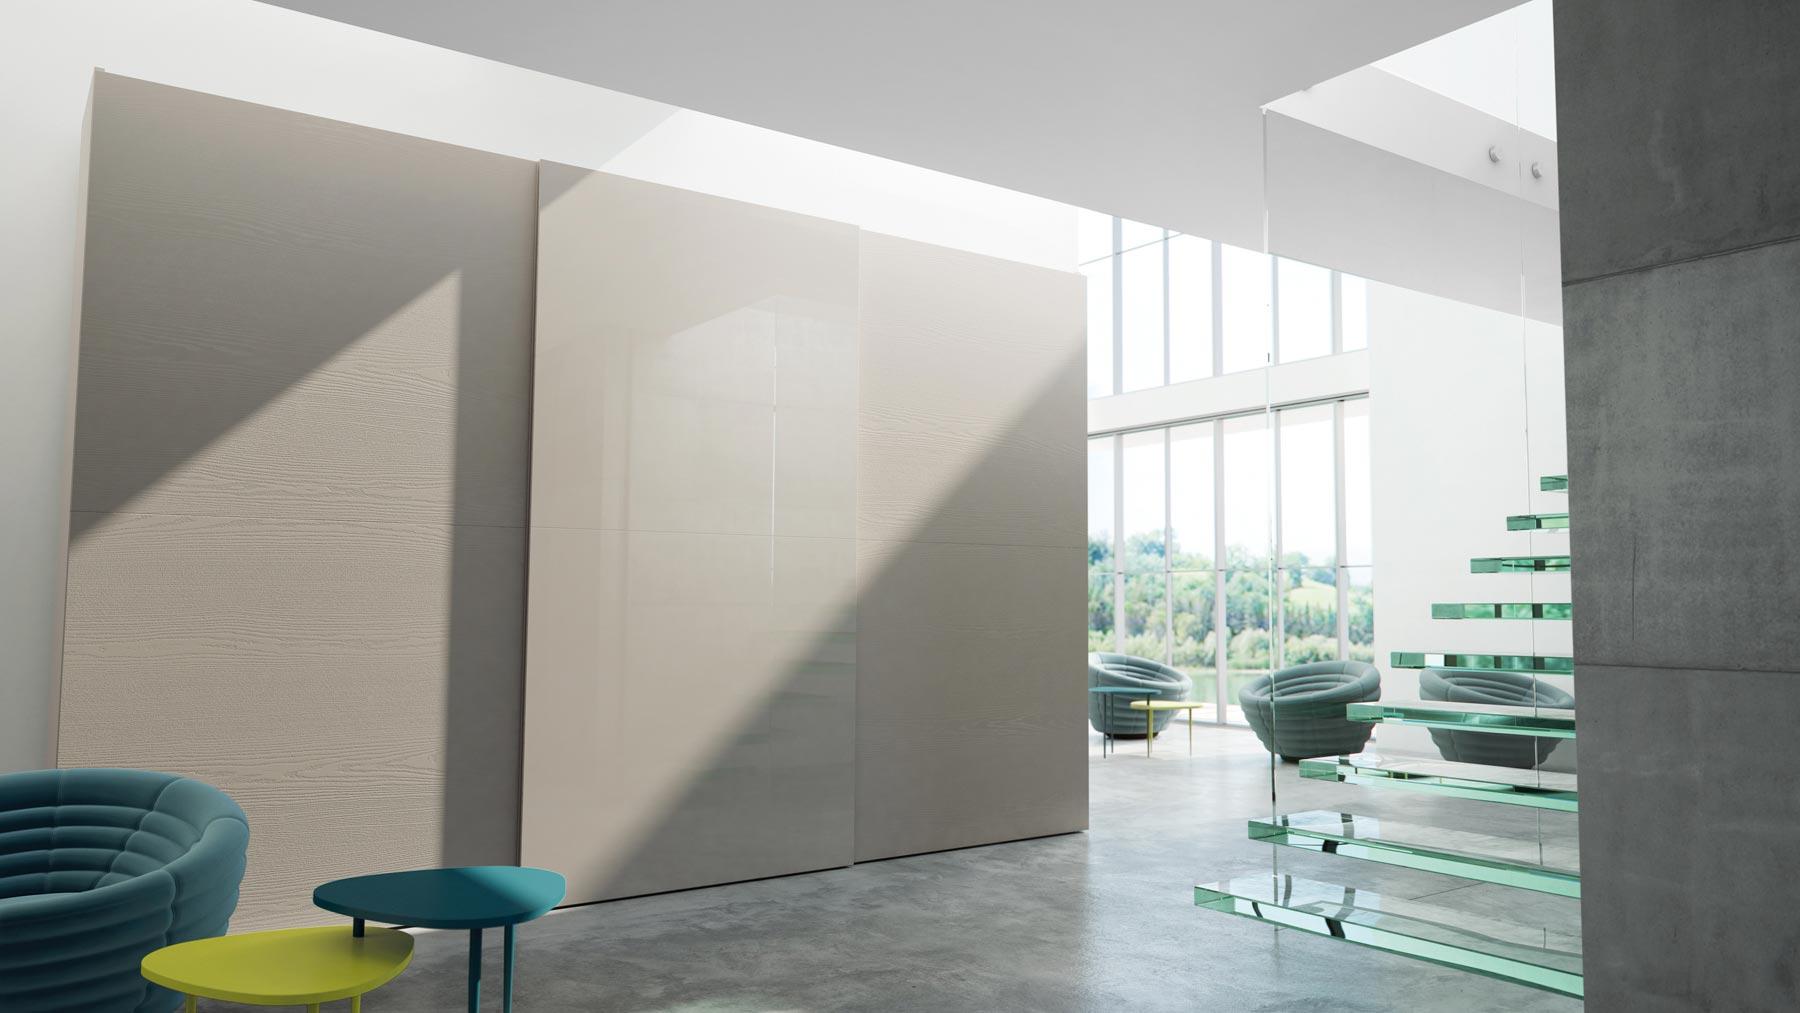 Modelo de armario de la serie FLAT de Caccaro